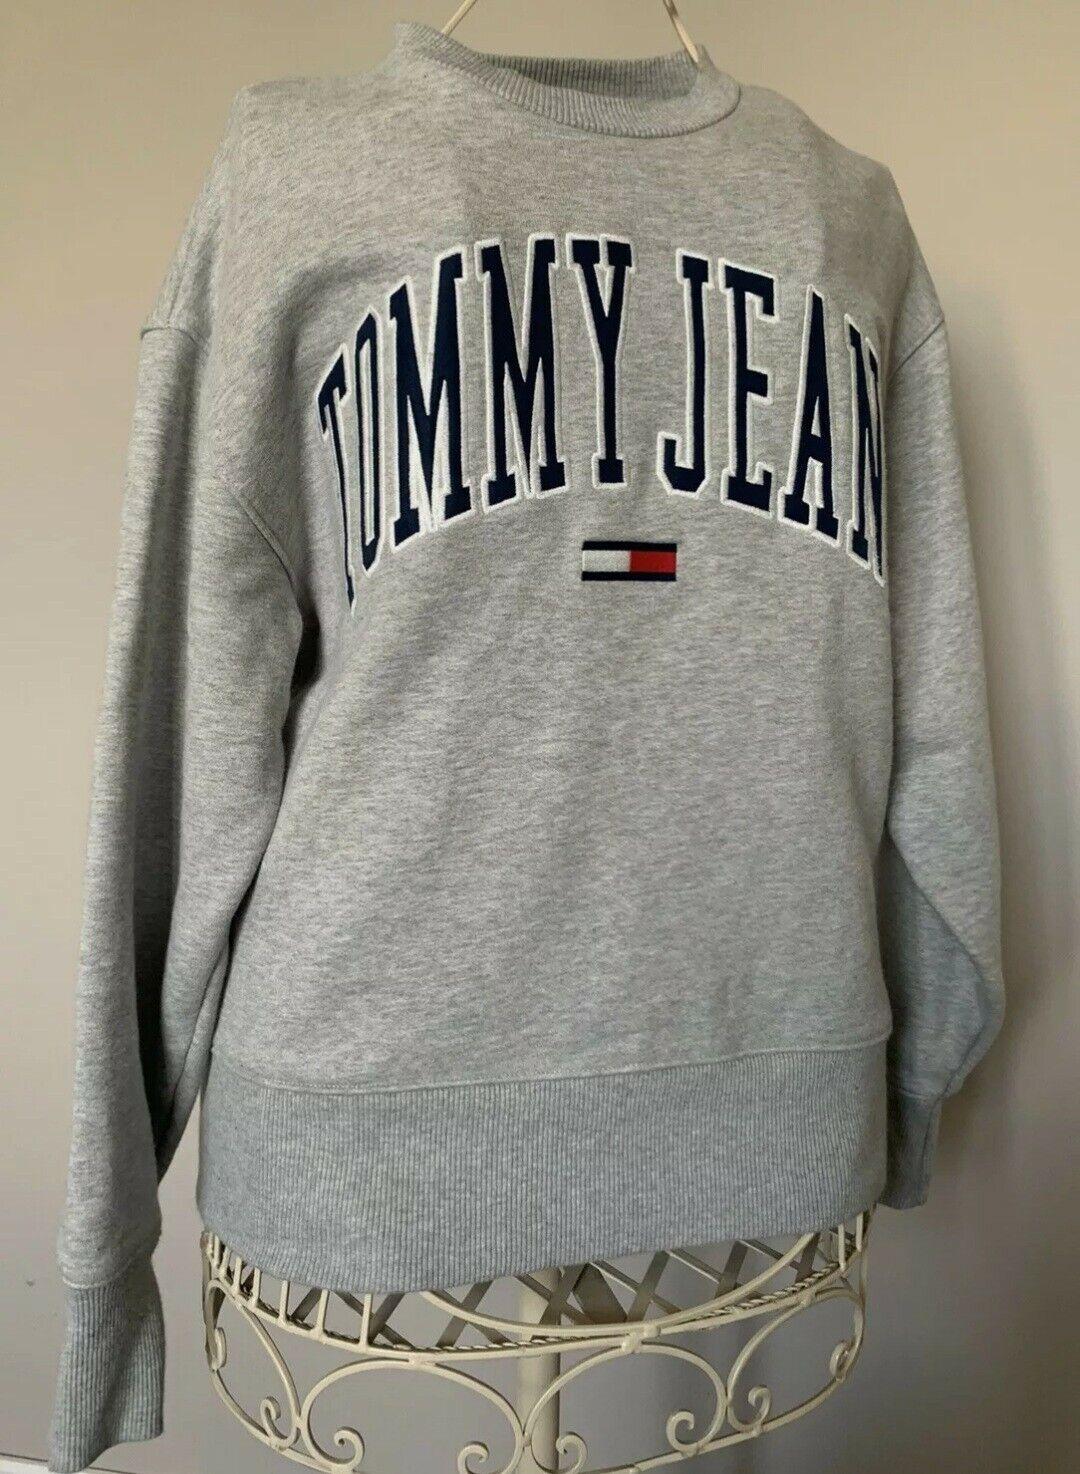 Tommy Hilfiger Grey Oversized Sweatshirt Size Uk 10/12/14 Genuine VGC